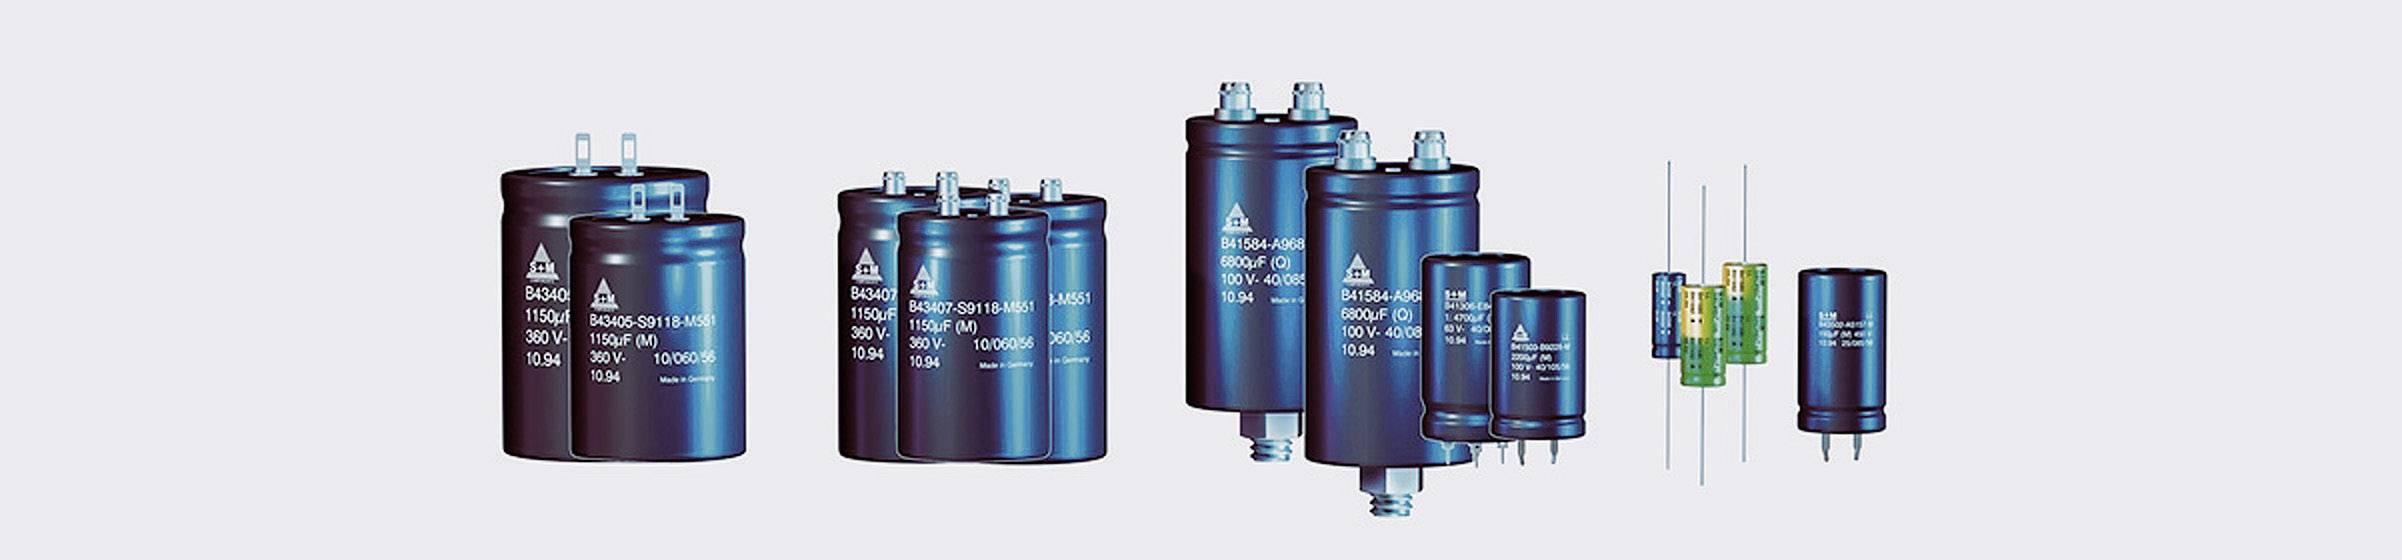 Elektrolytický kondenzátor 10000 µF Epcos B41456-B7109-M